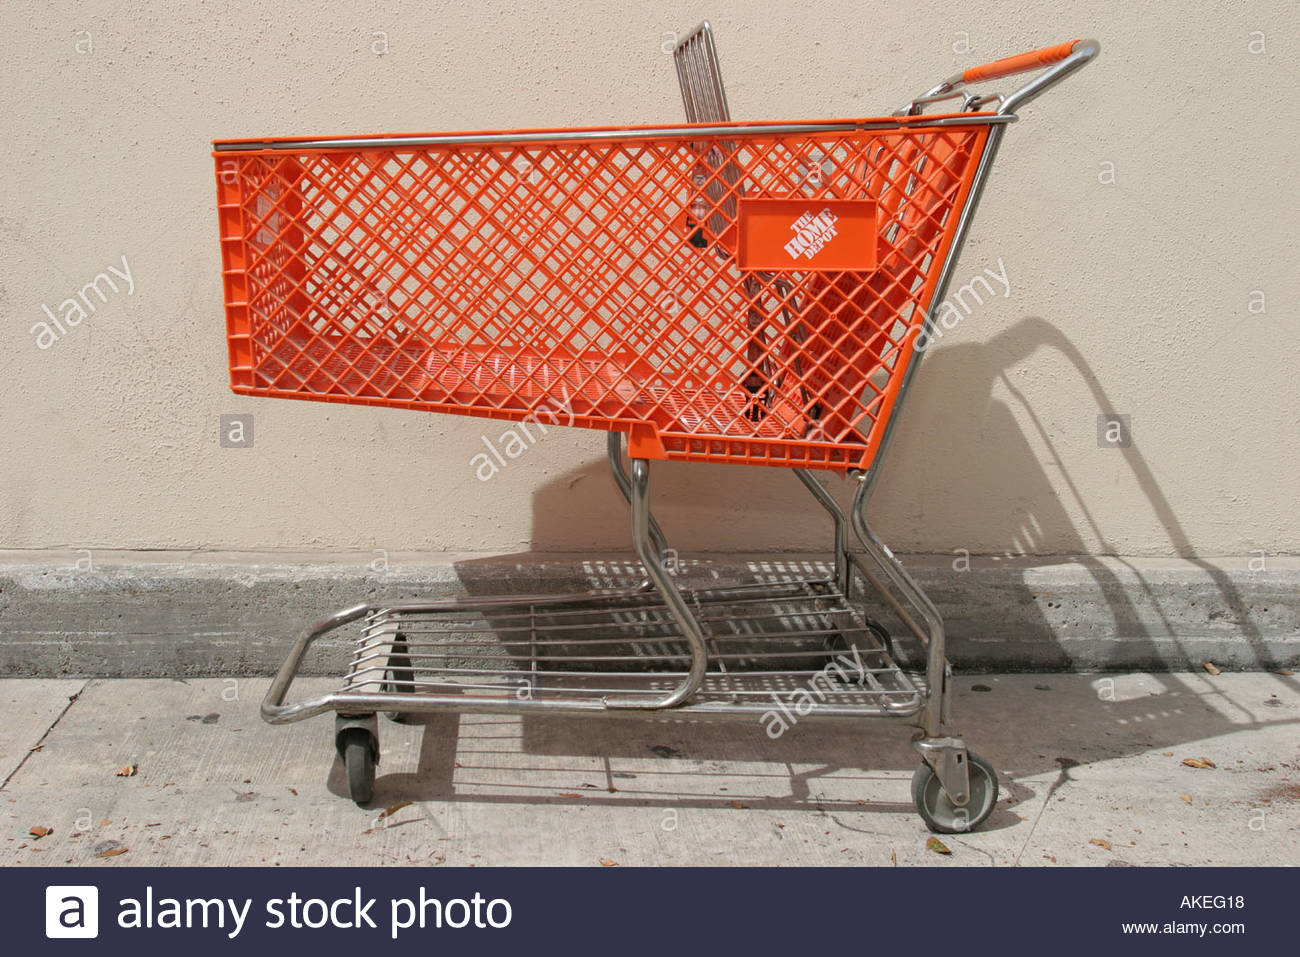 north miami beach florida home depot shopping cart AKEG18